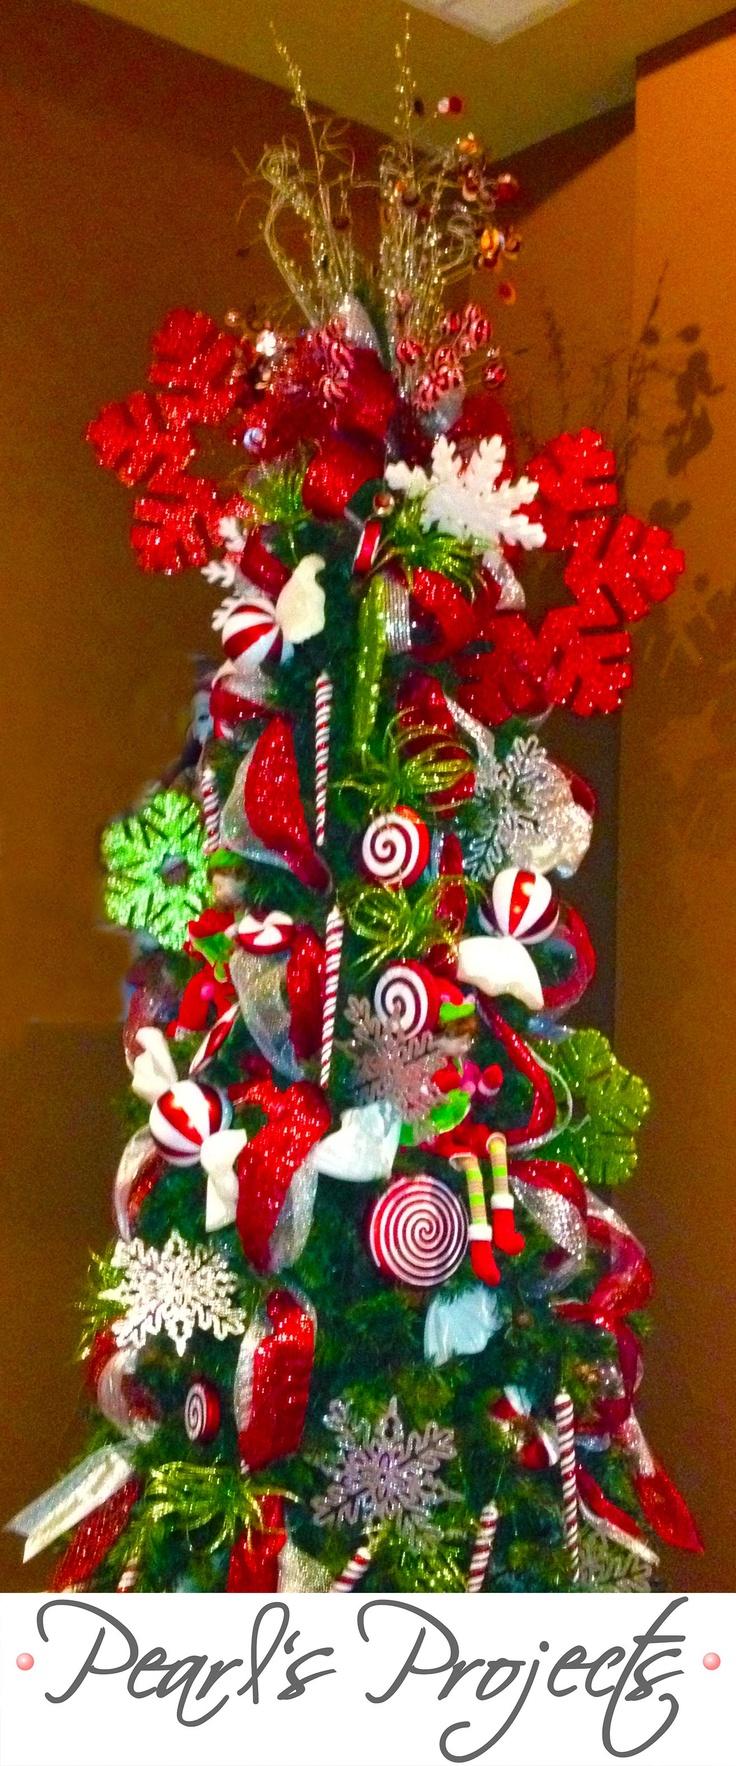 Candy tree!